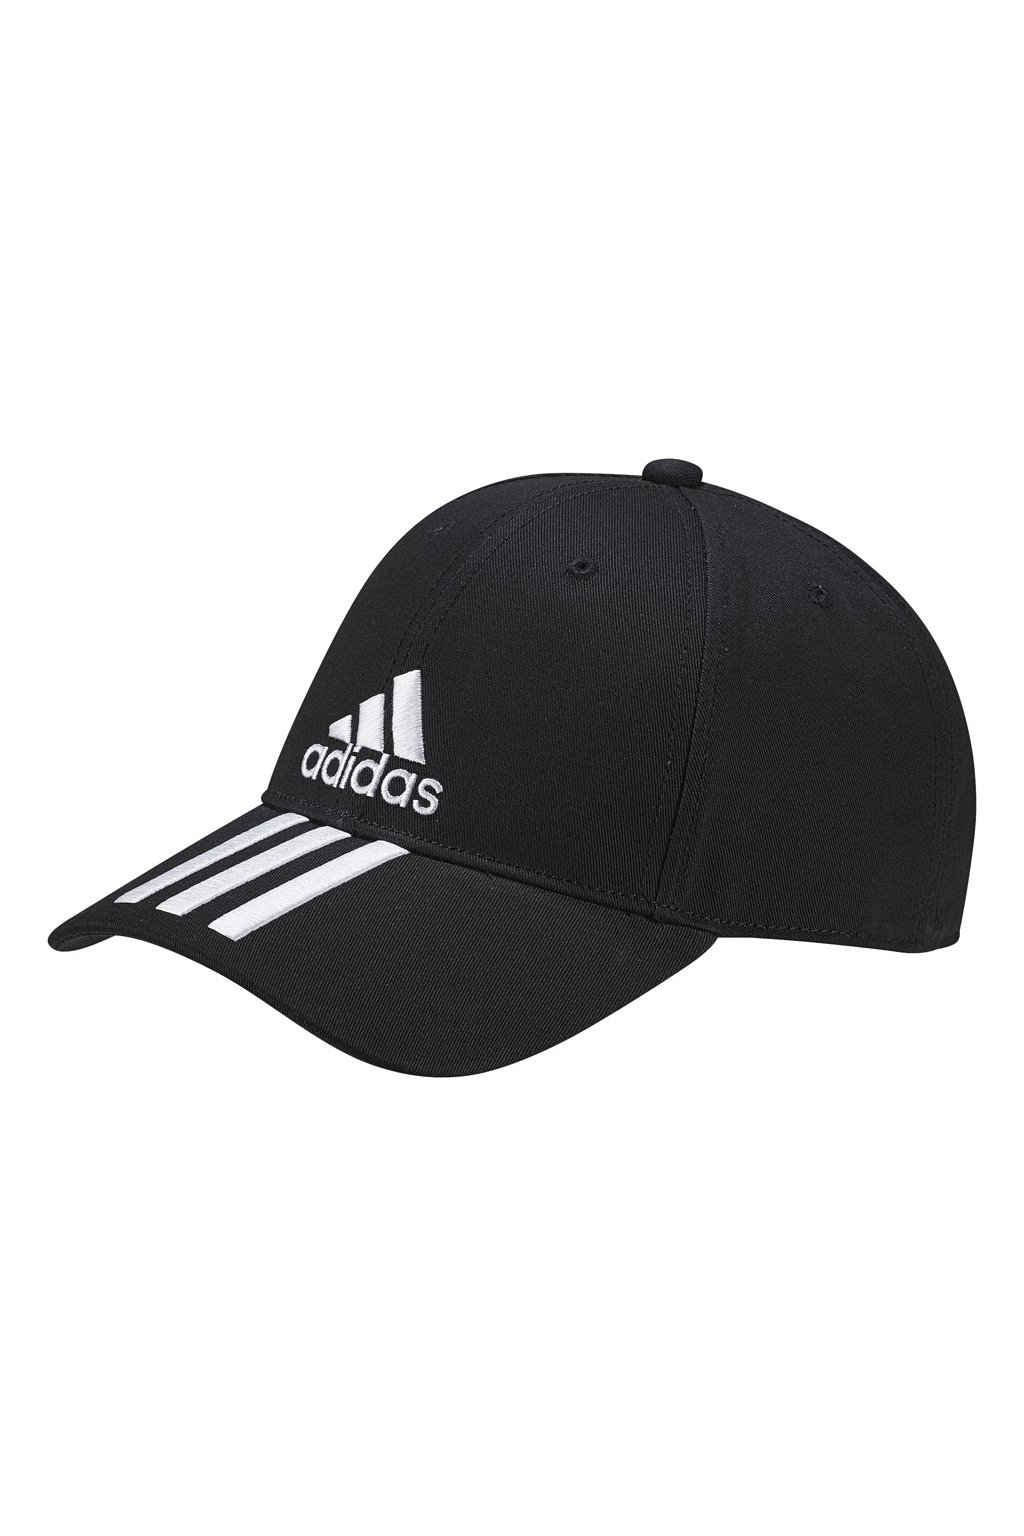 Adidas šiltovka čierna DU0196